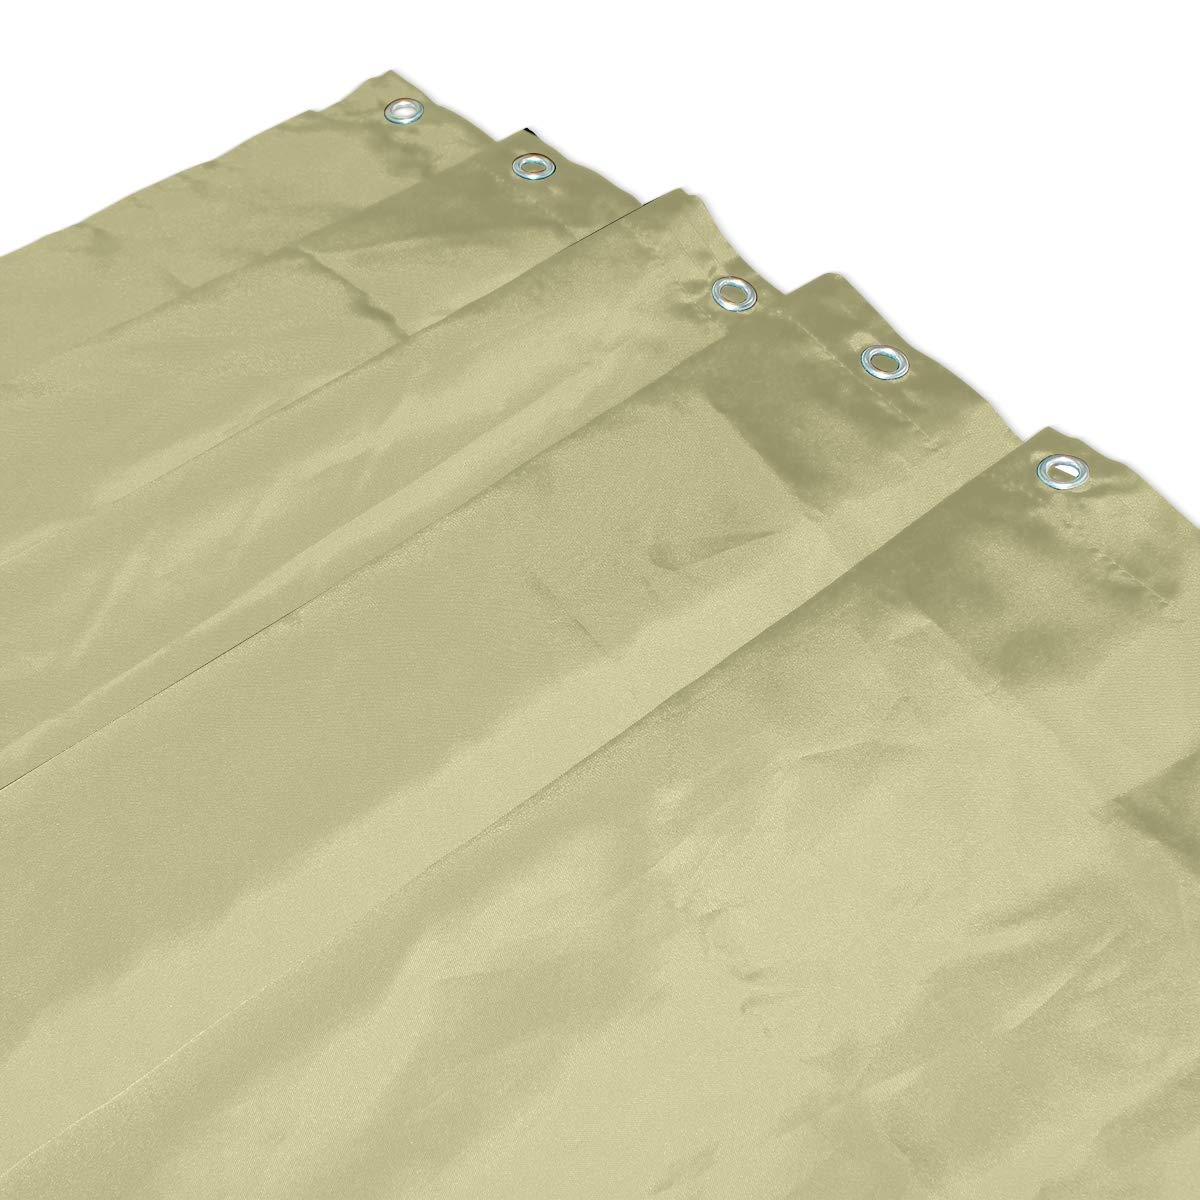 Watercolour Watercolor Paint Color Unique Custom Outdoor Shoulders Bag Fabric Backpack Multipurpose Daypacks For Adult